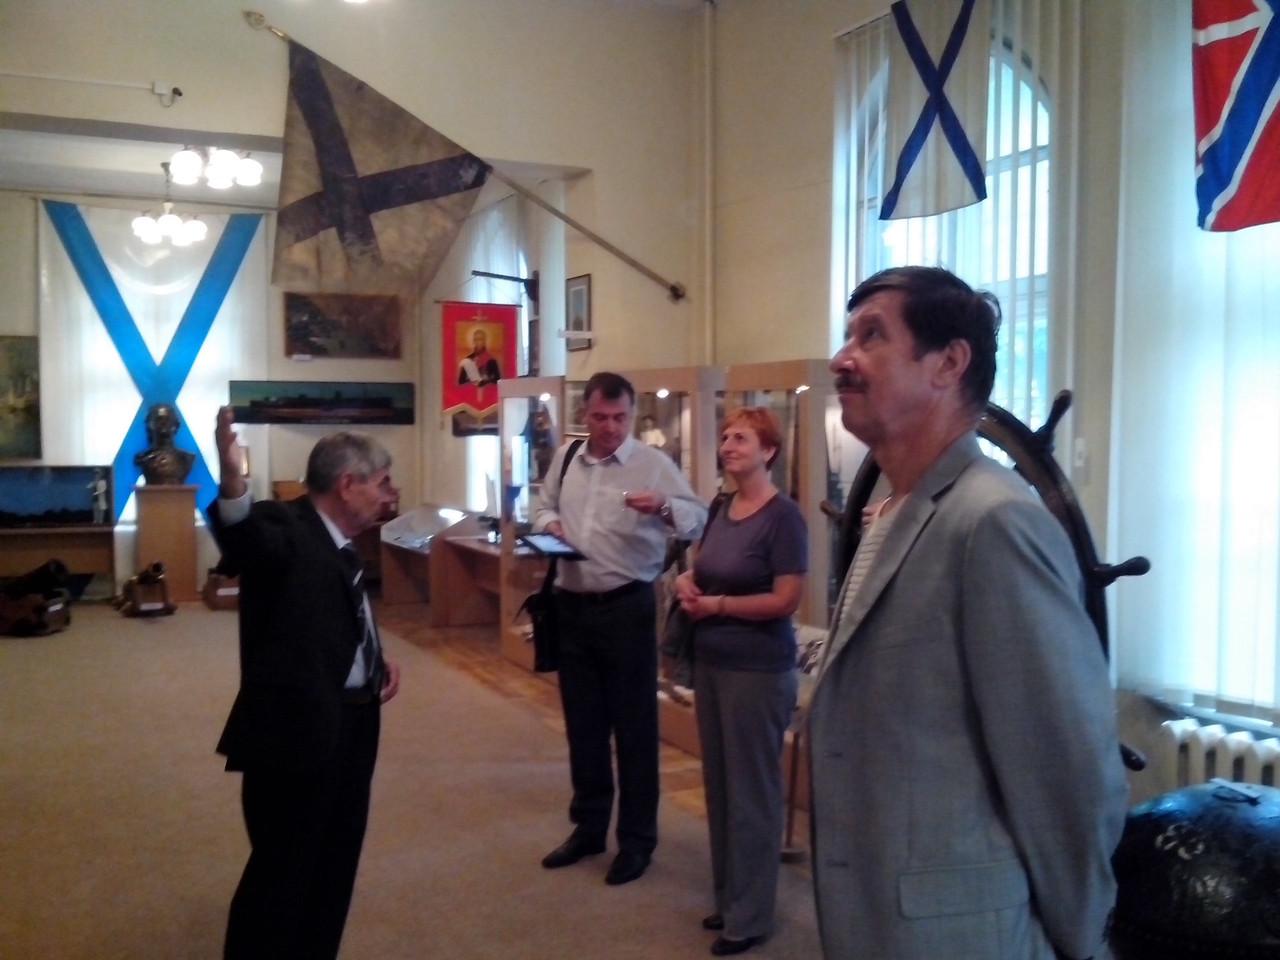 Участники конференции в Музее Балтийского флота